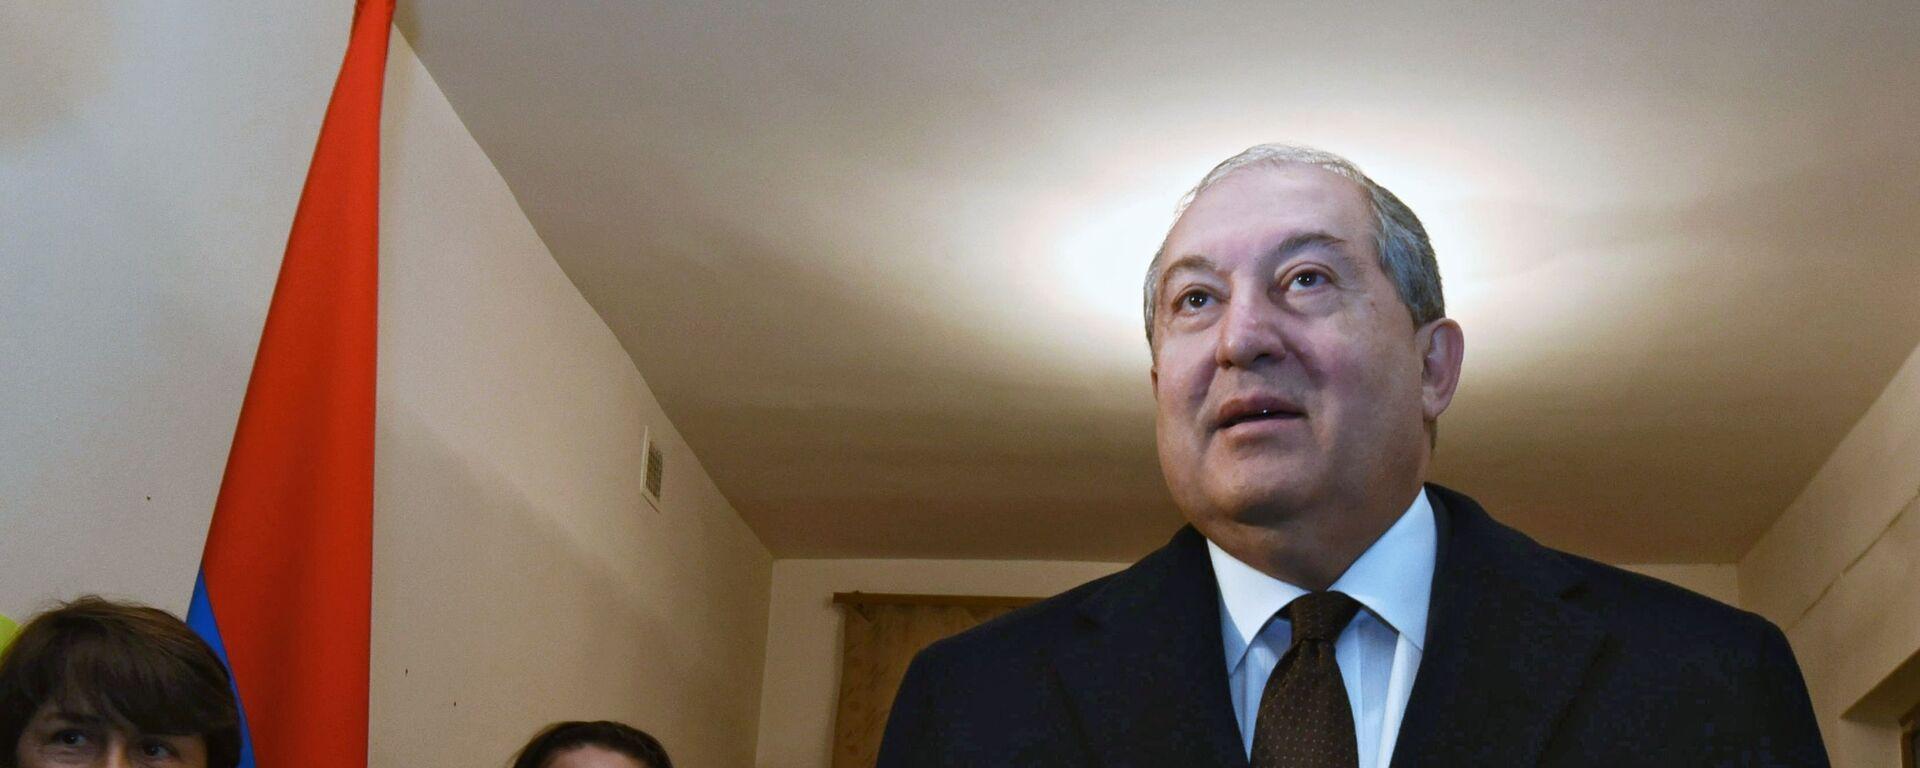 Armén Sarkisián, el presidente de Armenia - Sputnik Mundo, 1920, 20.07.2021